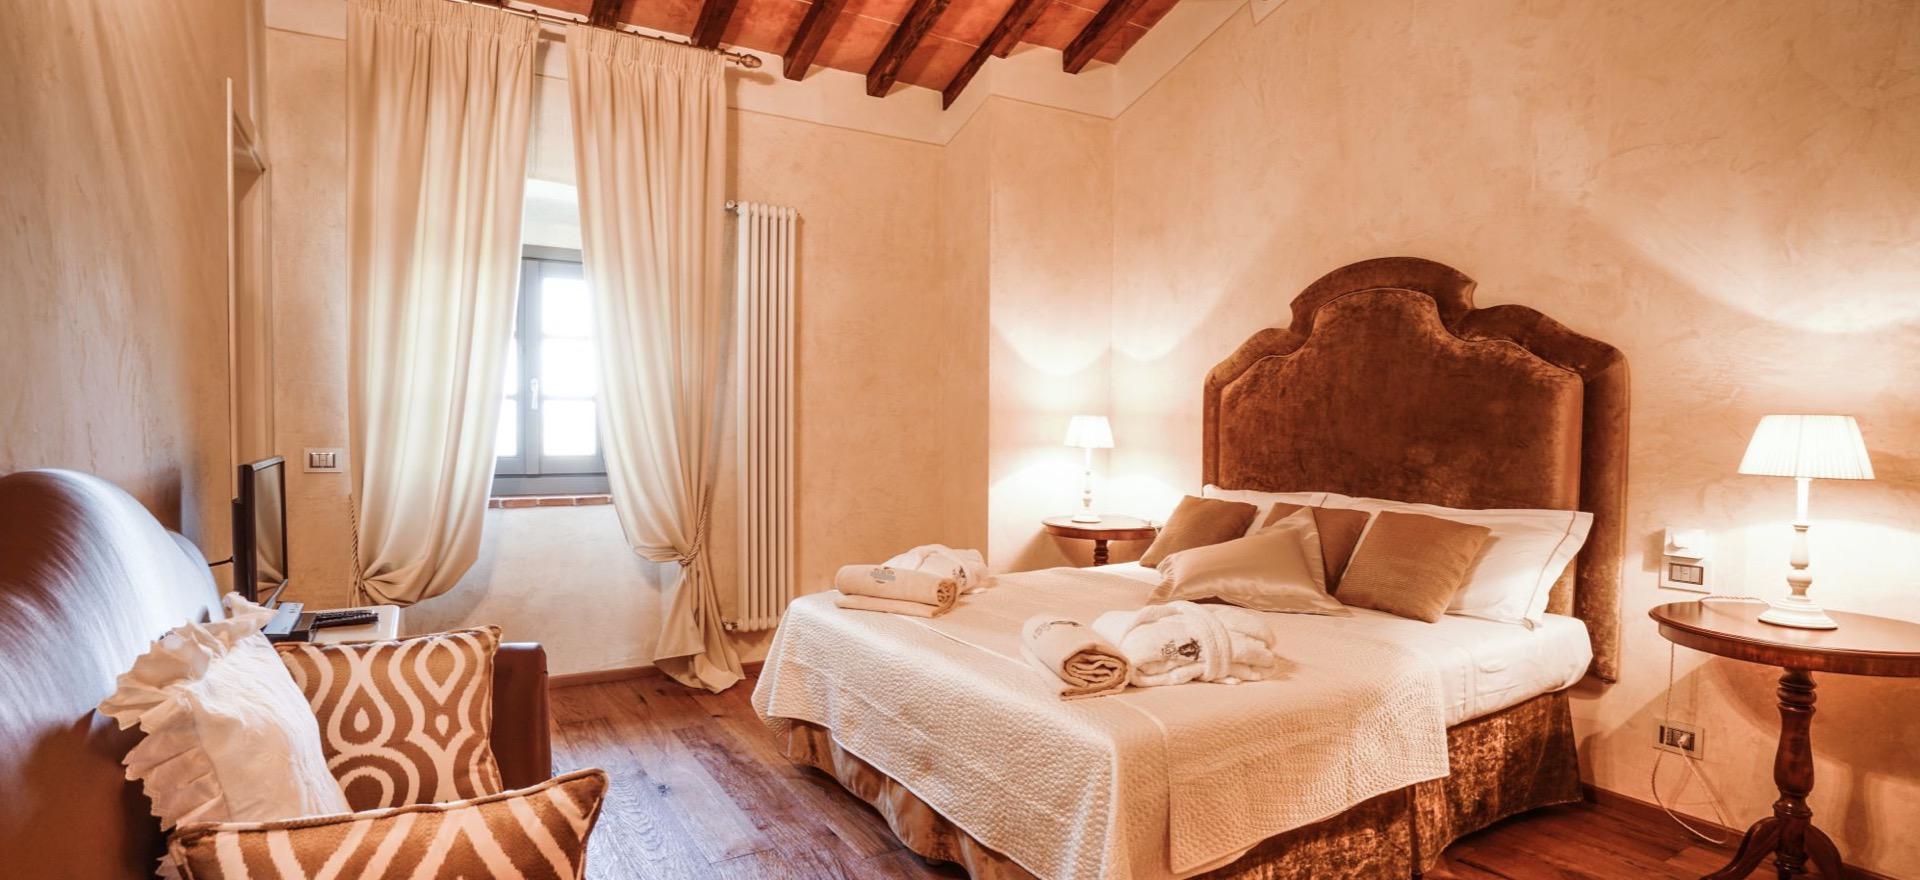 Agriturismo Toscane Design B&B in chique villa in Toscana